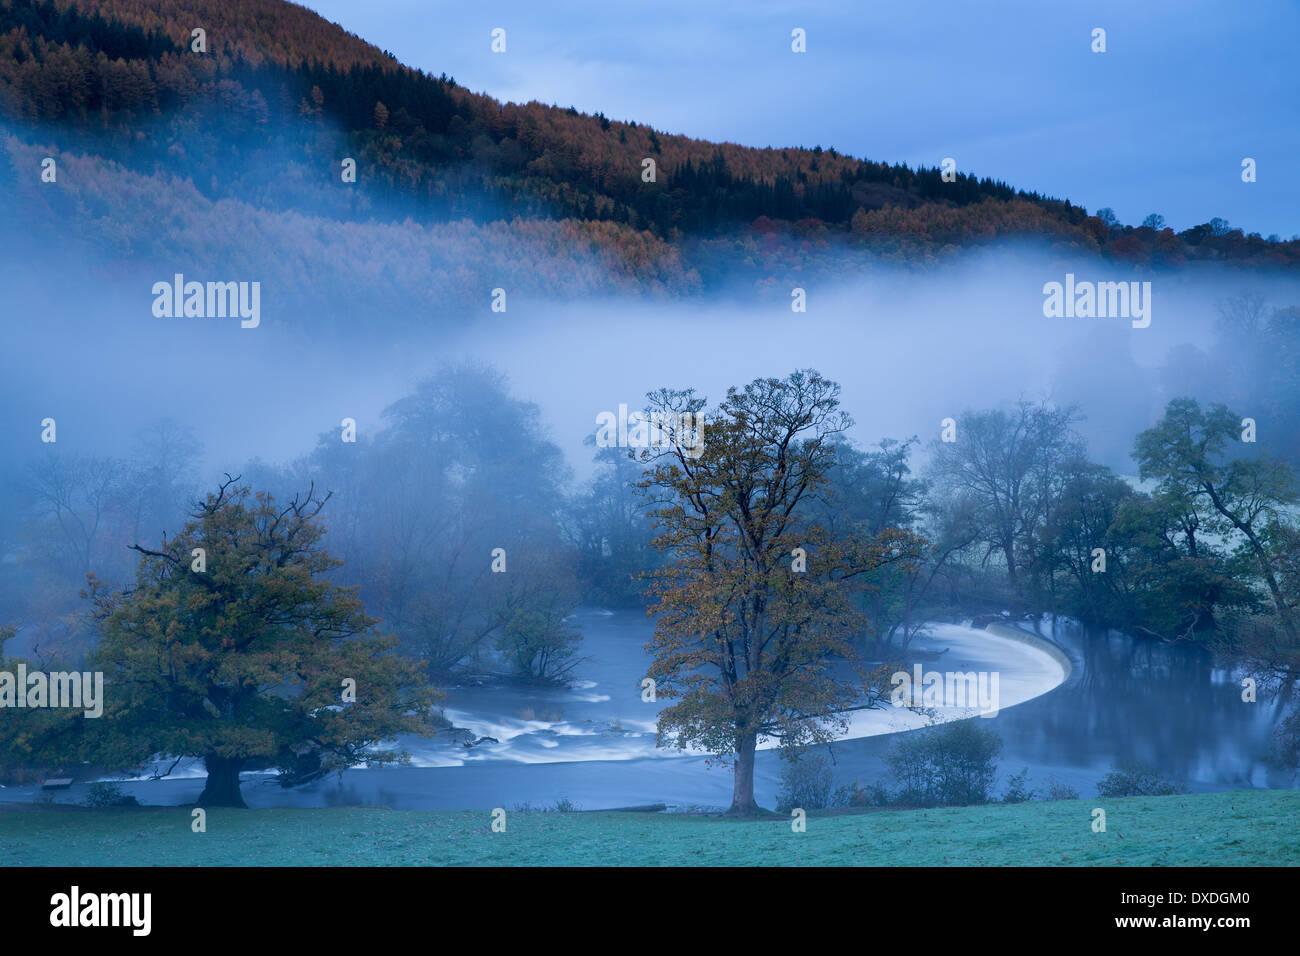 autumn colours and mist in the Dee Valley (Dyffryn Dyfrdwy) at Horseshoe Falls near Llangollen, Denbighshire, Wales - Stock Image